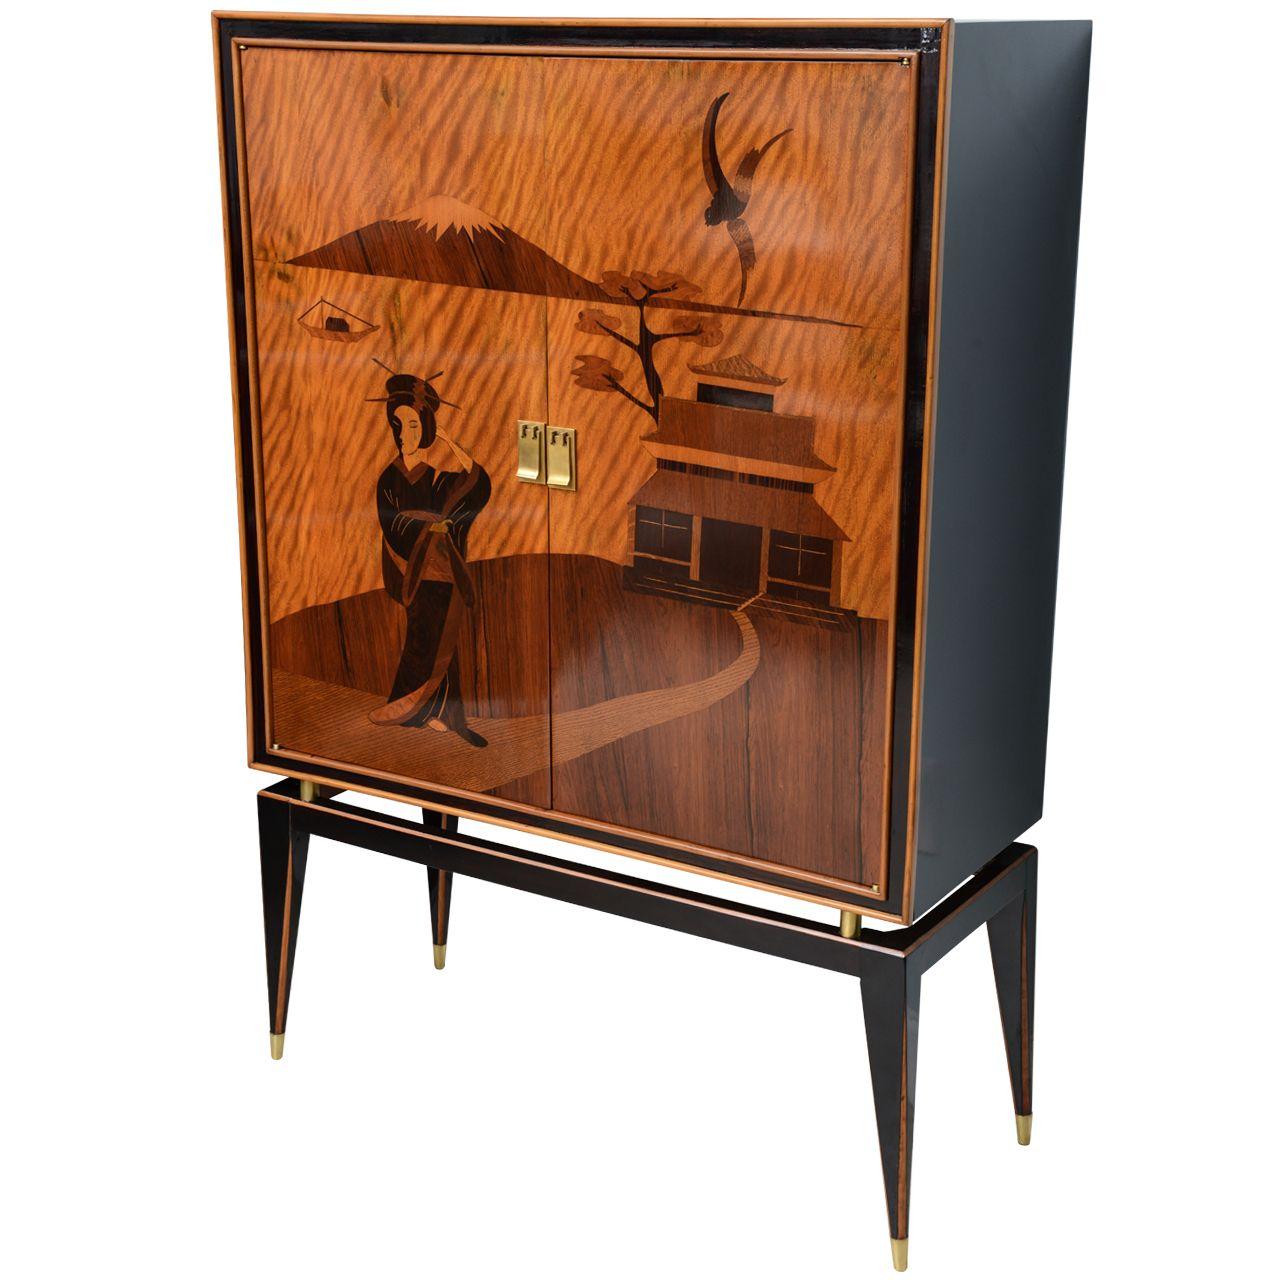 A Fine Italian Modern Marquetry Inlaid Bar Cabinet, Paolo Buffa Italy 1950s  Exhibitor: Gary